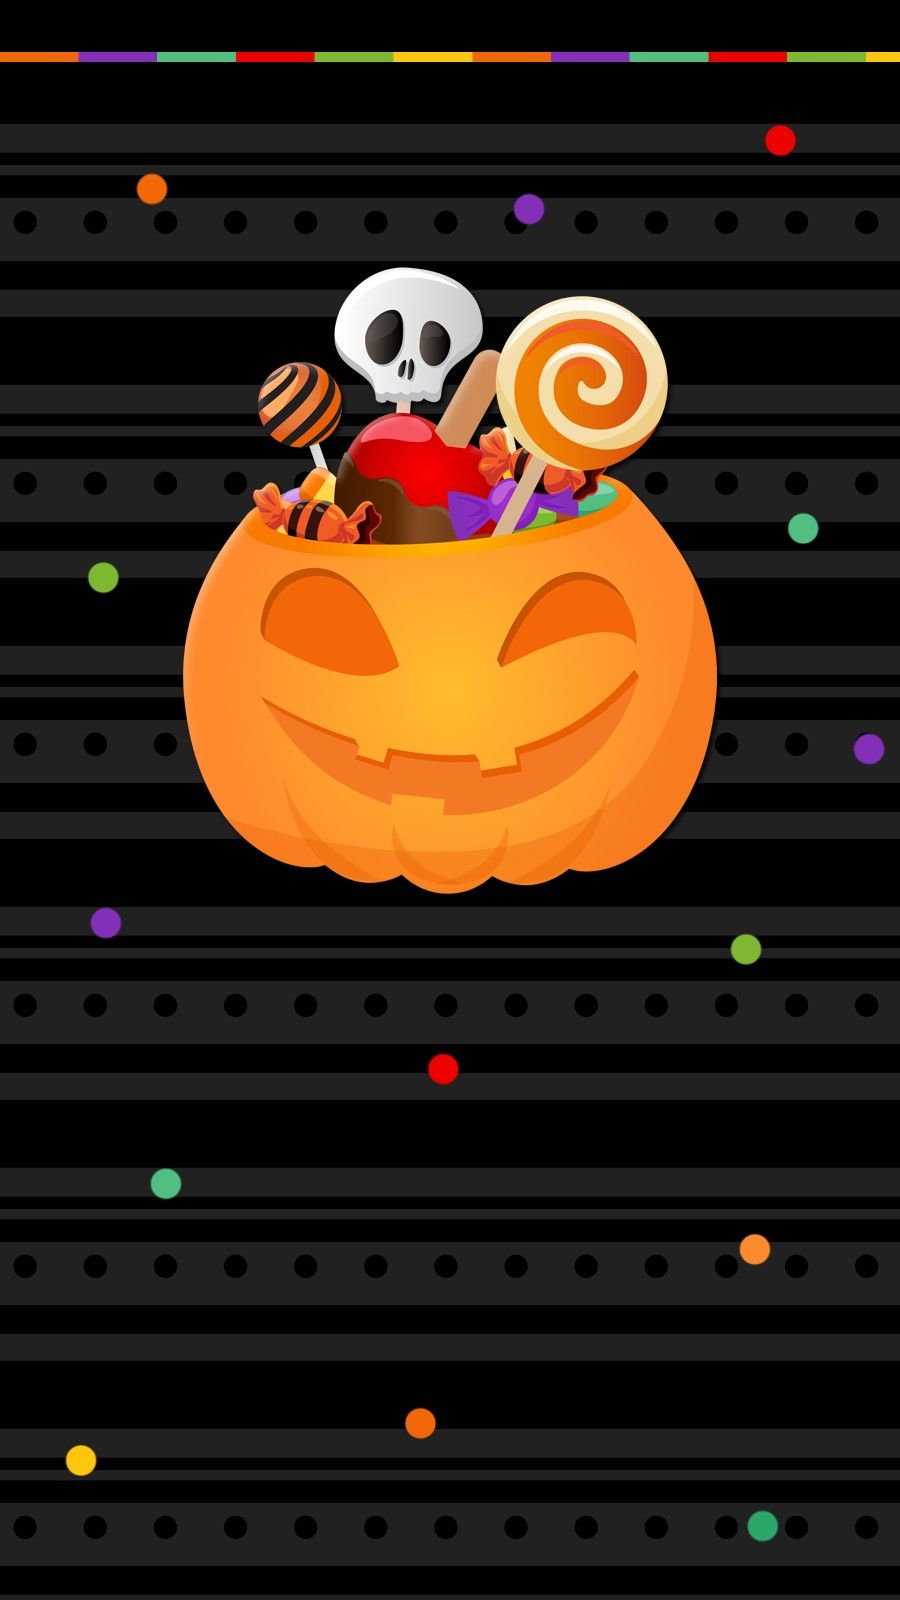 Pin By Angelmom4 On Cute Wallz Halloween Wallpaper Iphone Halloween Wallpaper Halloween Printables Free